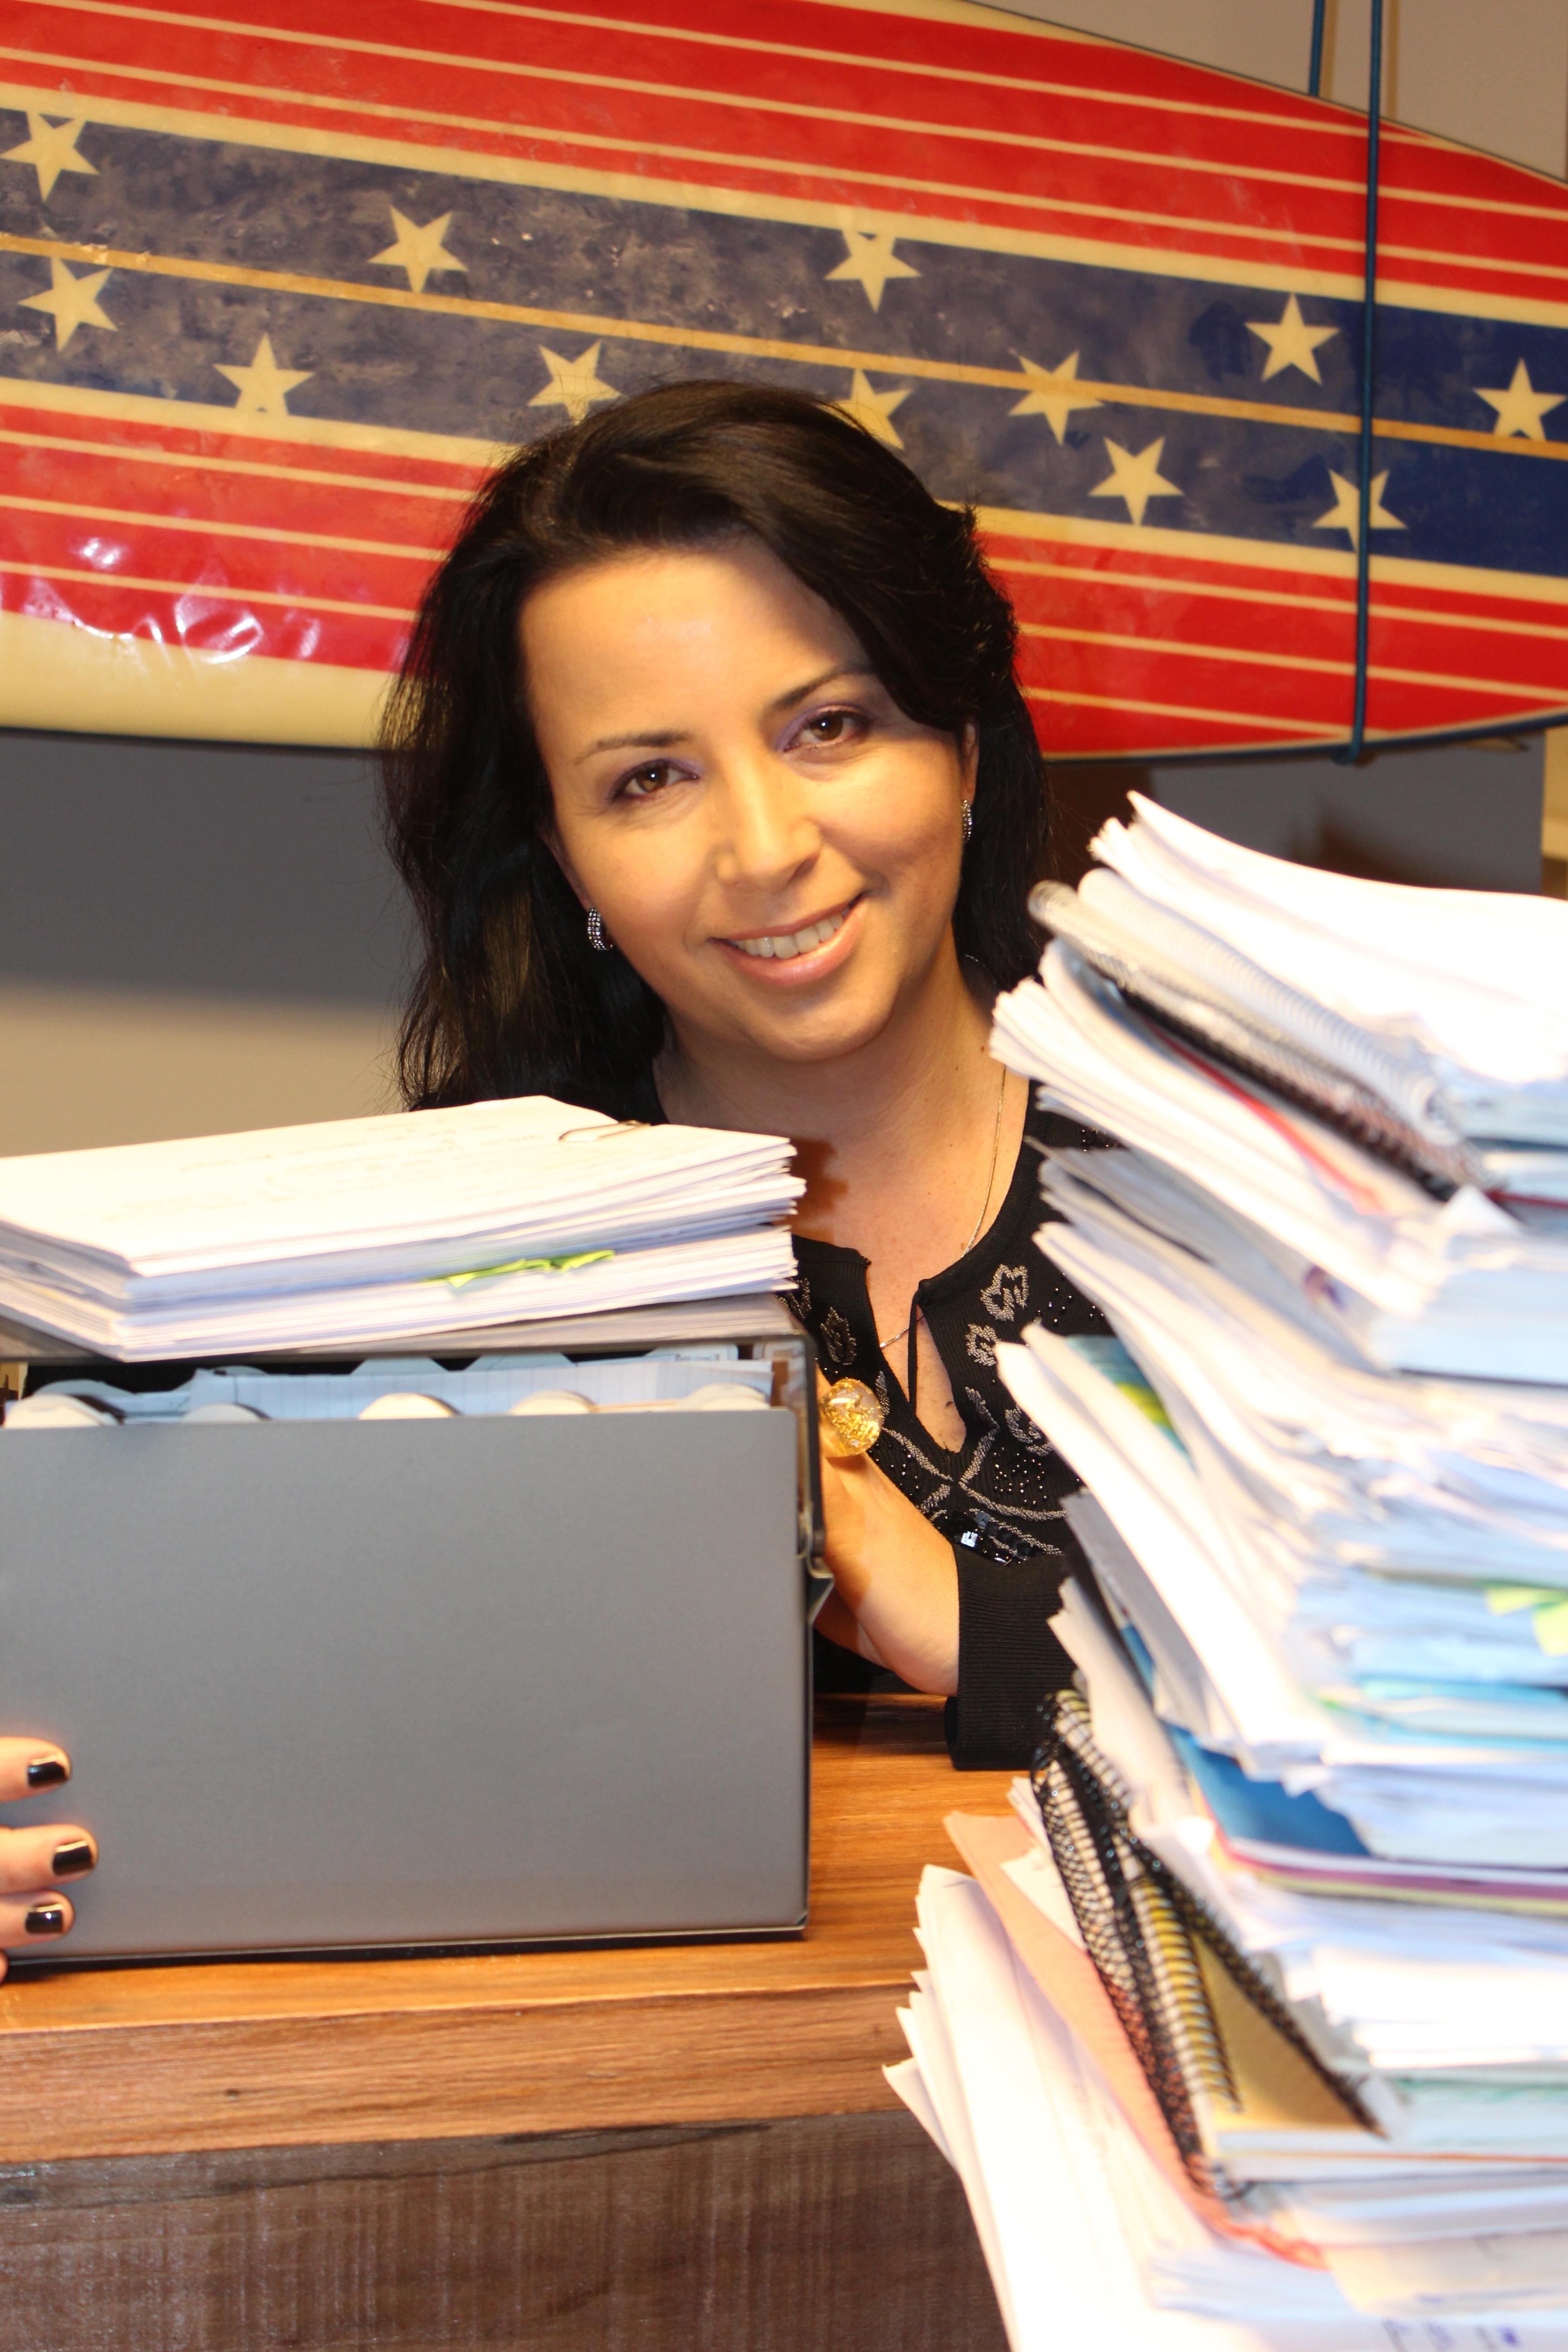 Katia Gisele de Souza - Aprovada no concurso de  Auditor Fiscal da SEFAZ/RS 2014